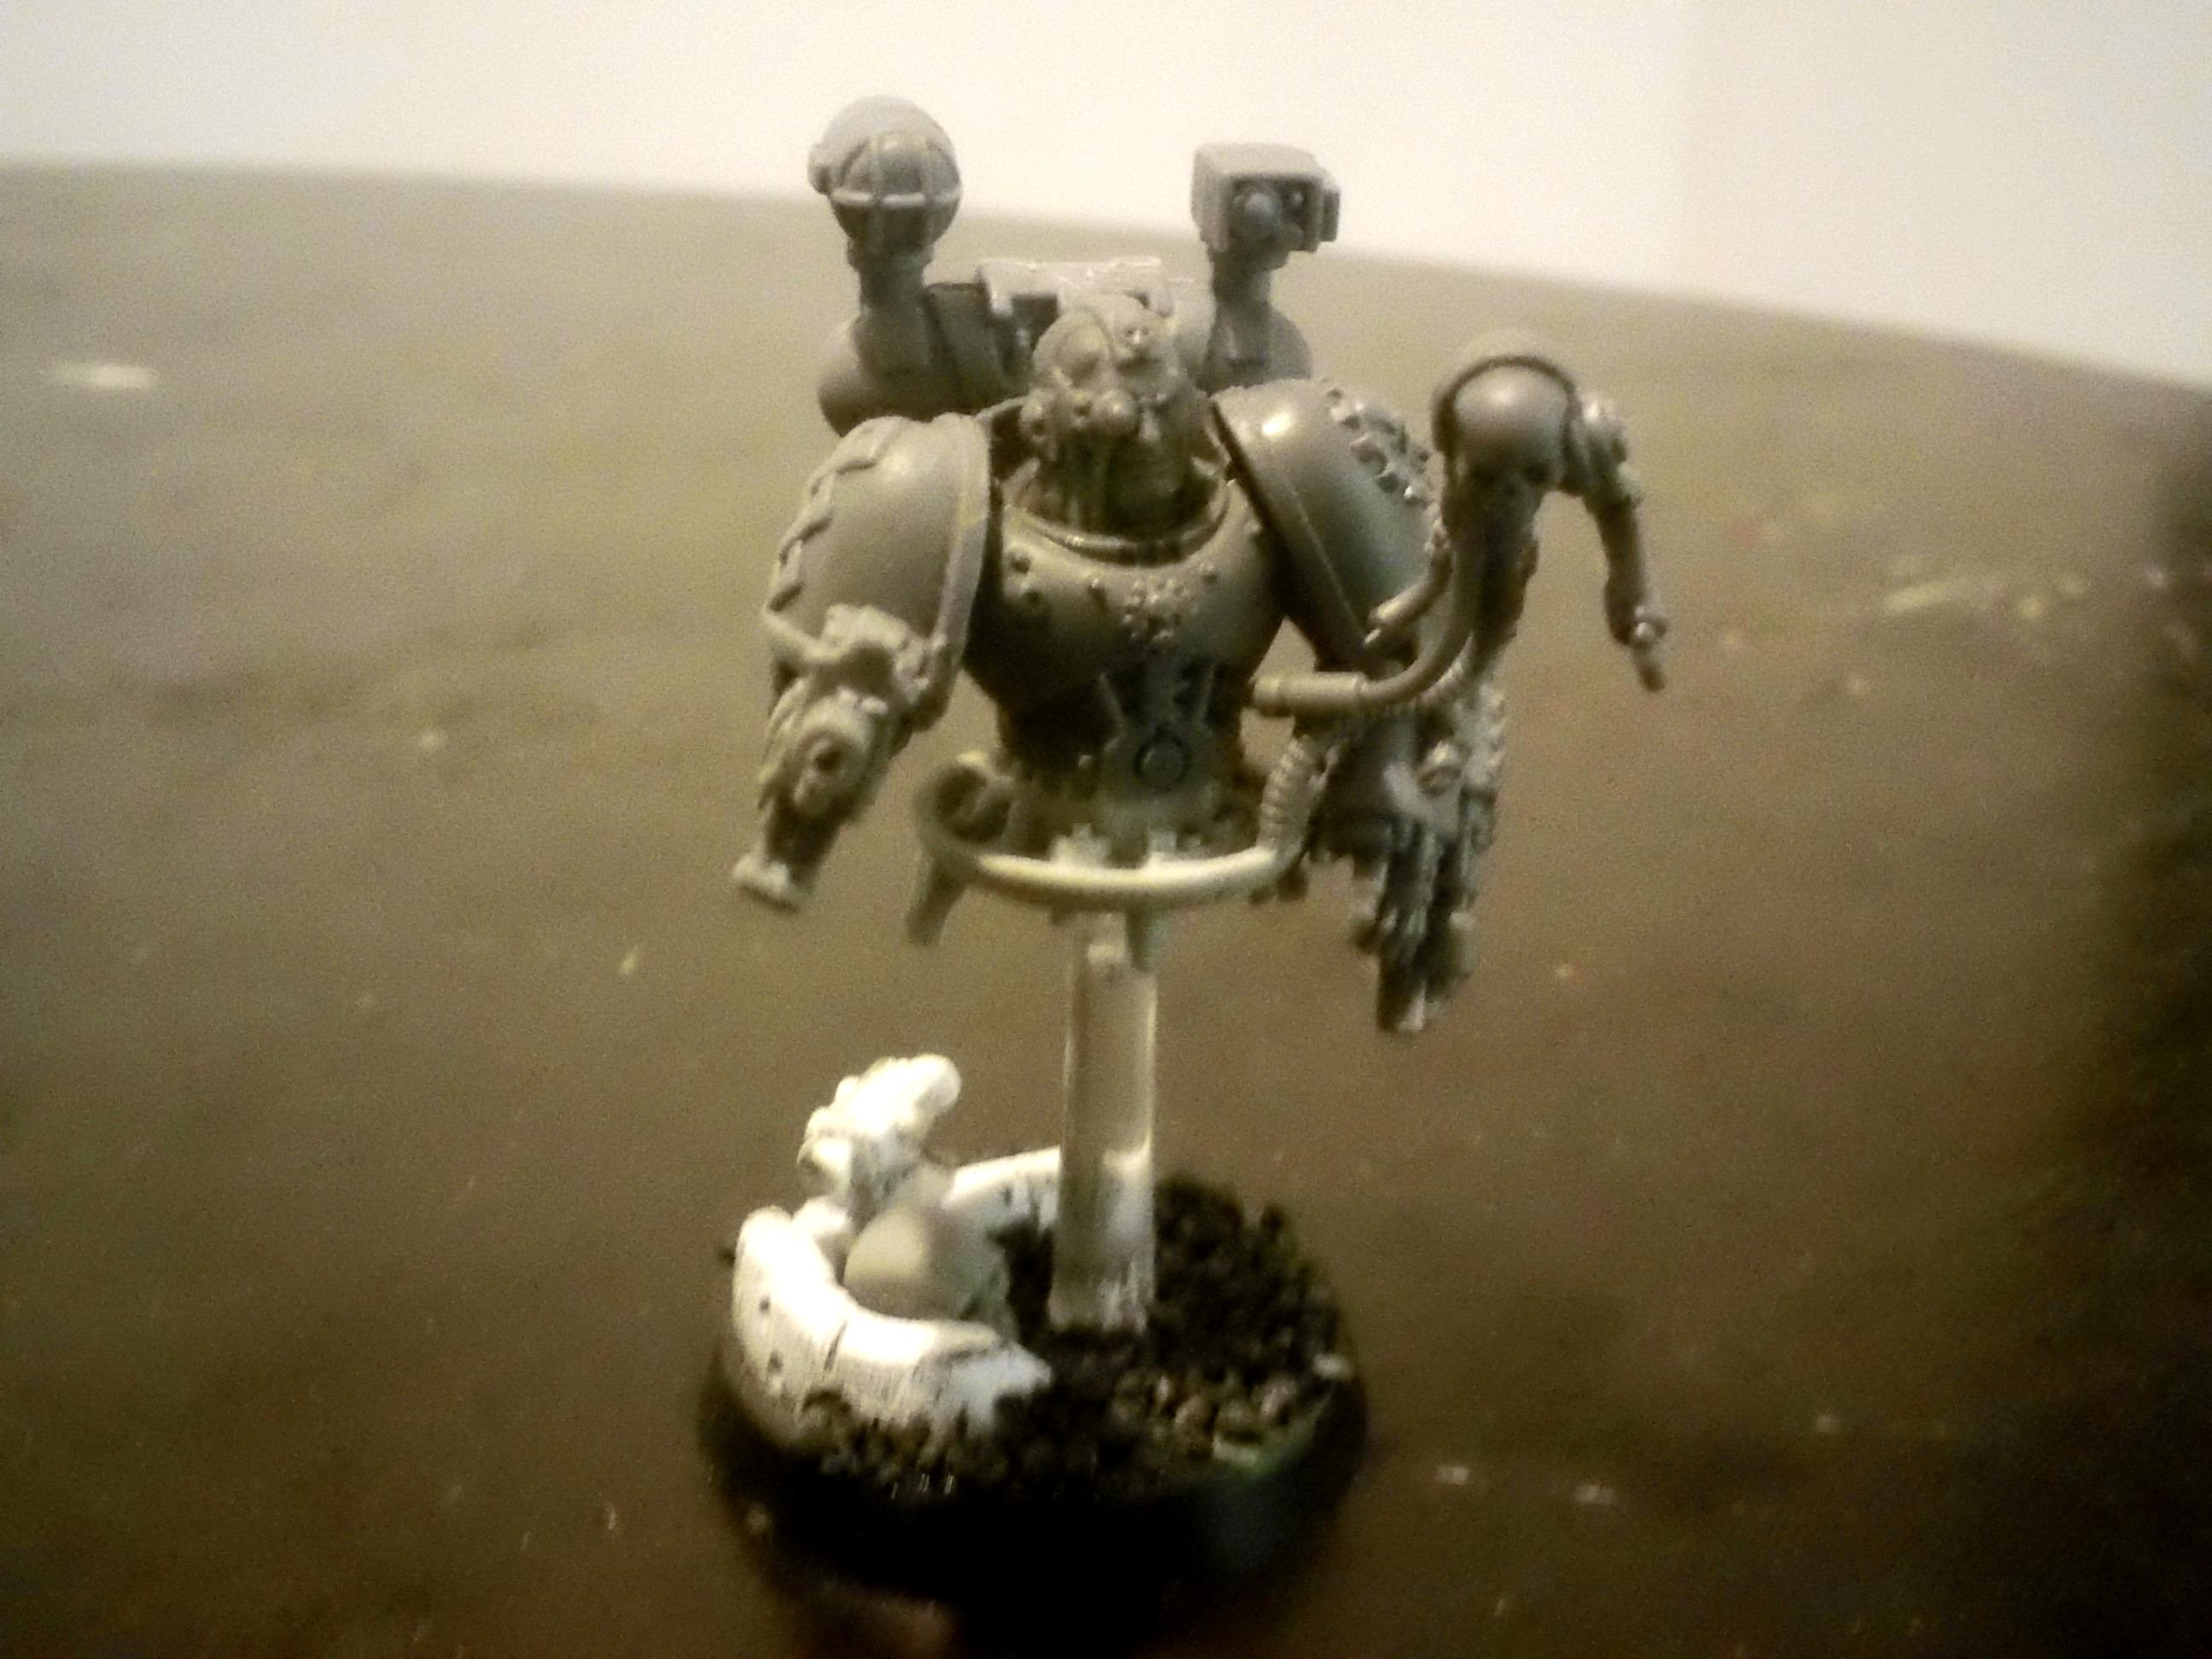 Adeptus, Apothecary, Mechanicus, Servo Skull, Work In Progress